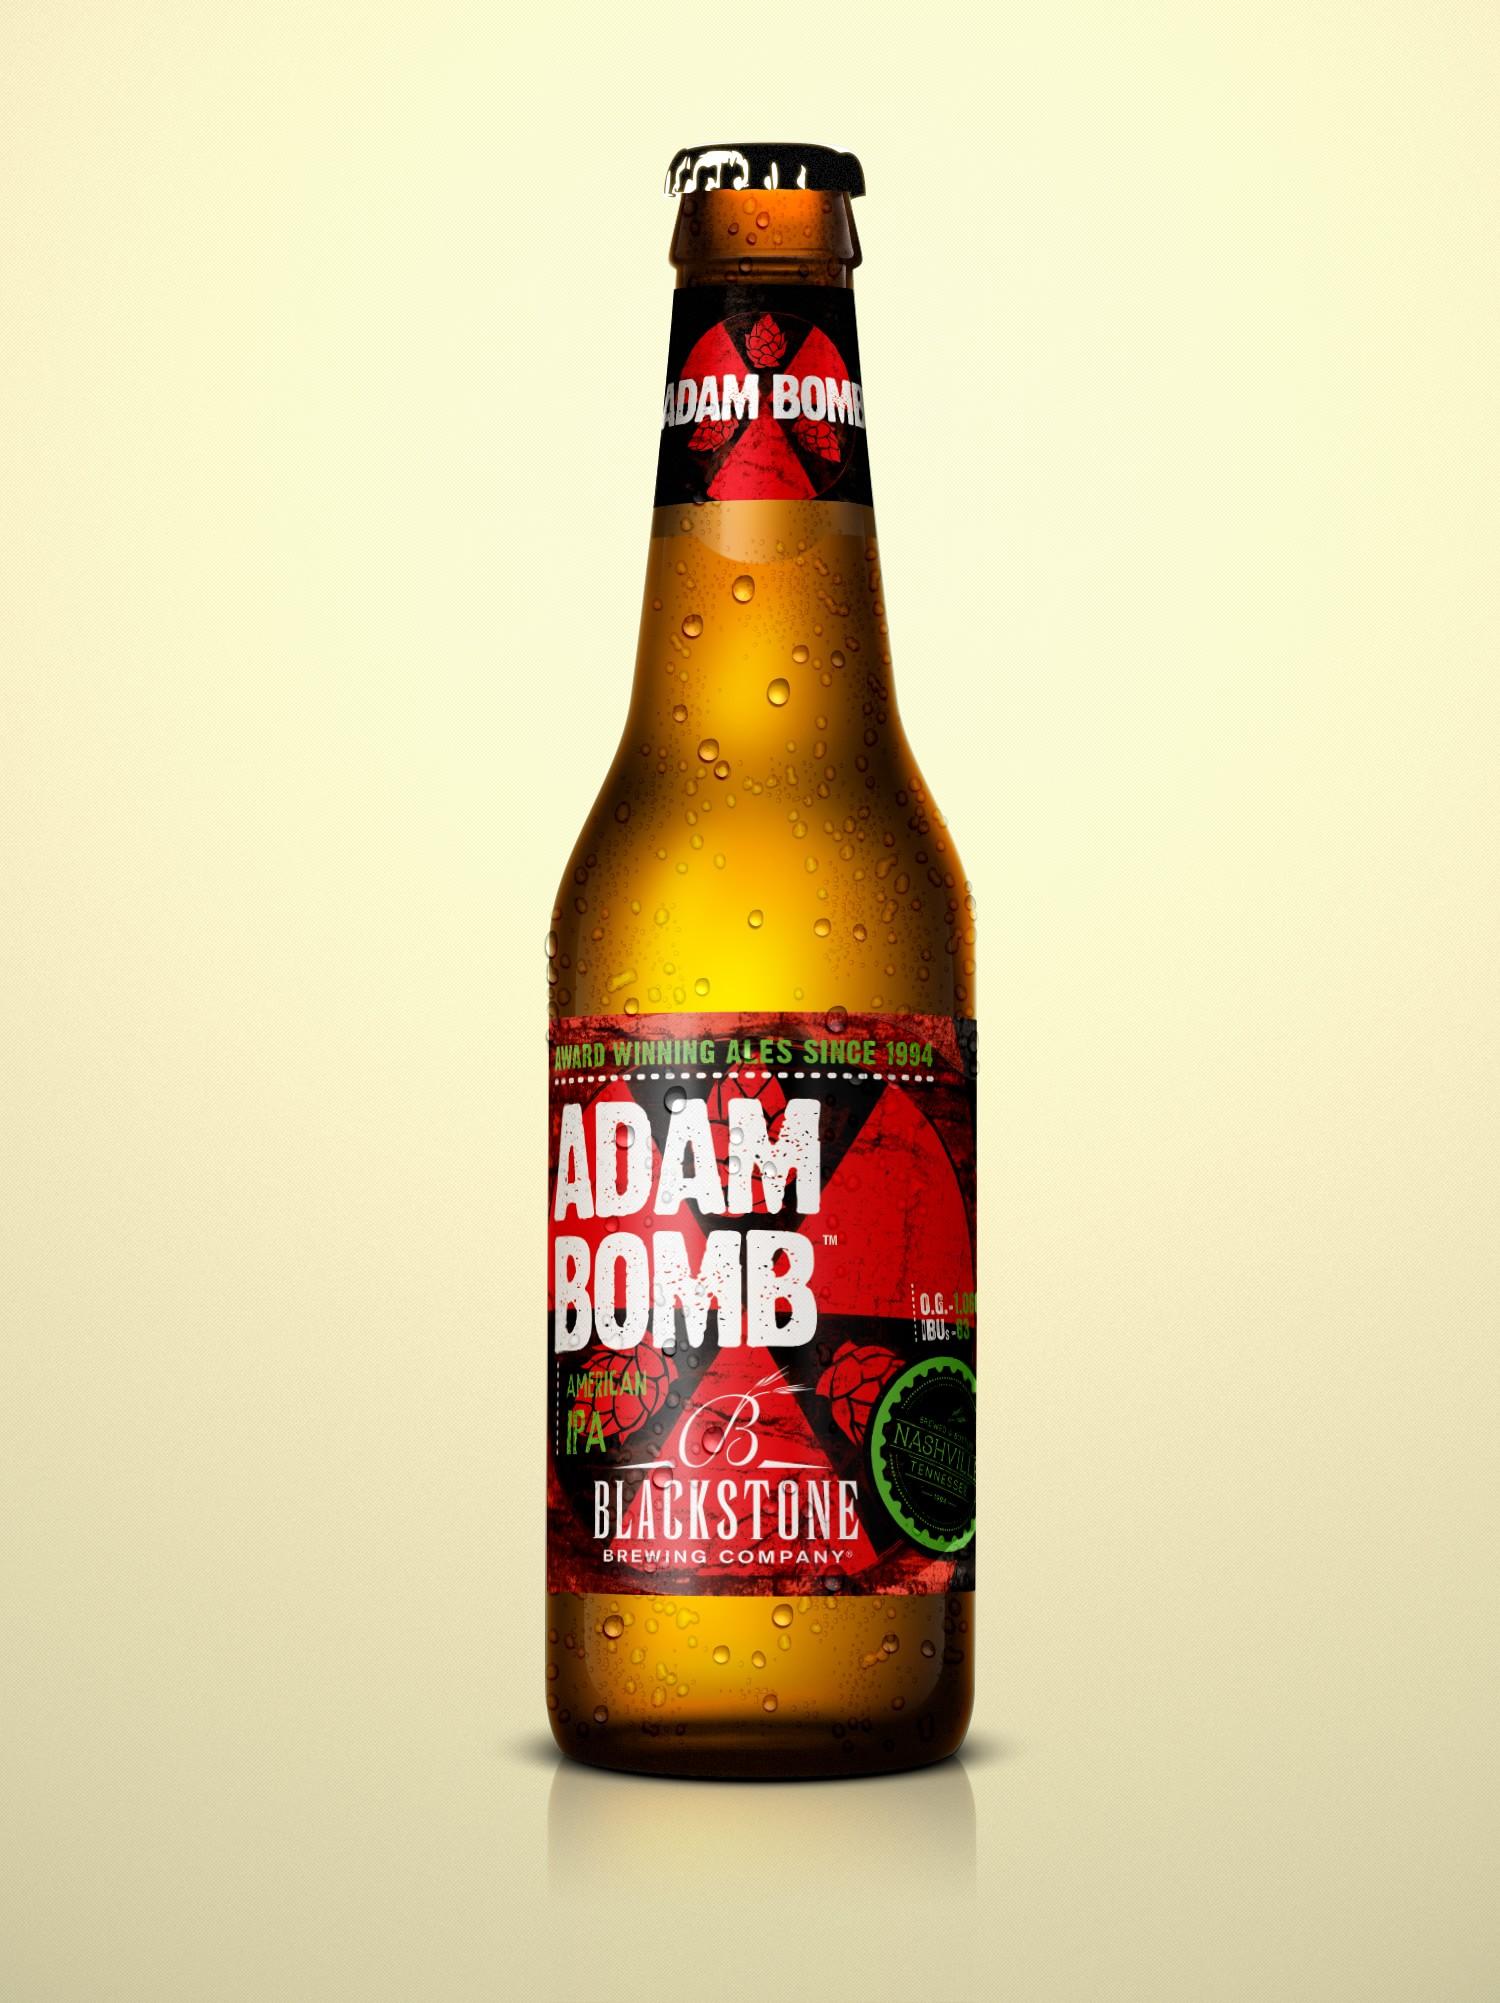 Blackstone Brewing Company Adam Bomb Bottle Label